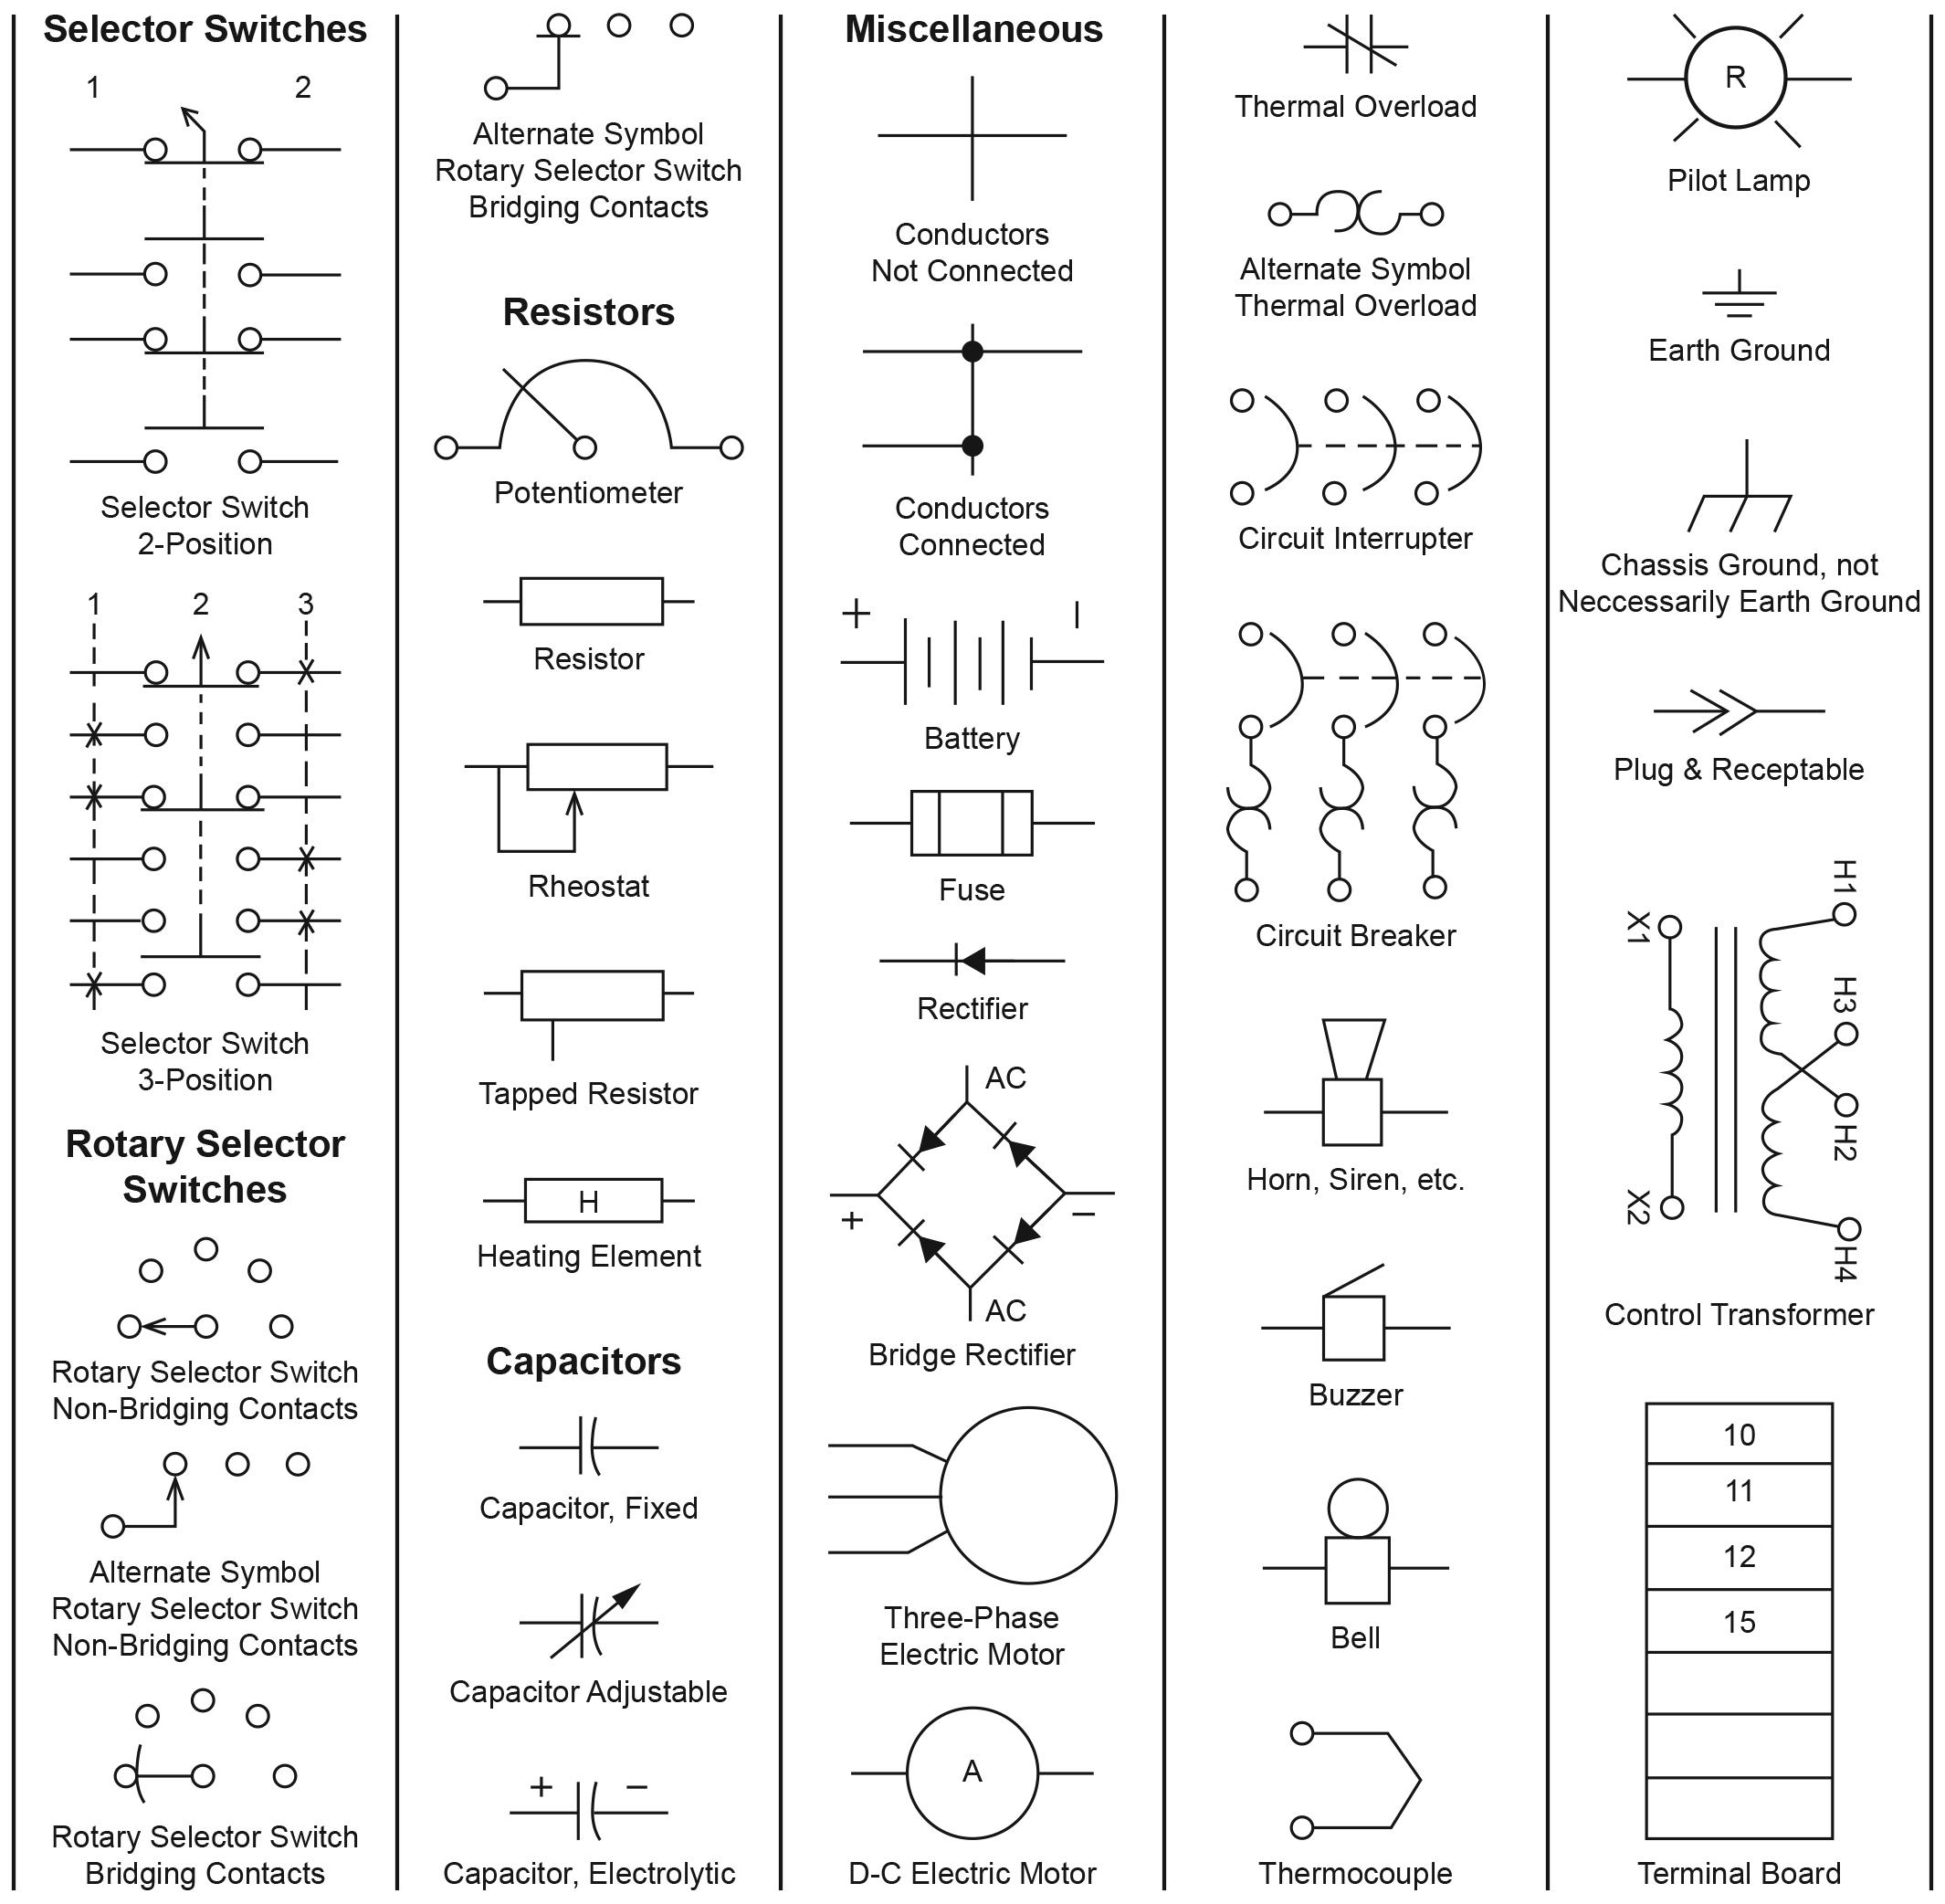 industrial wiring diagram symbols ford tractor isa motor starter symbol impremedia